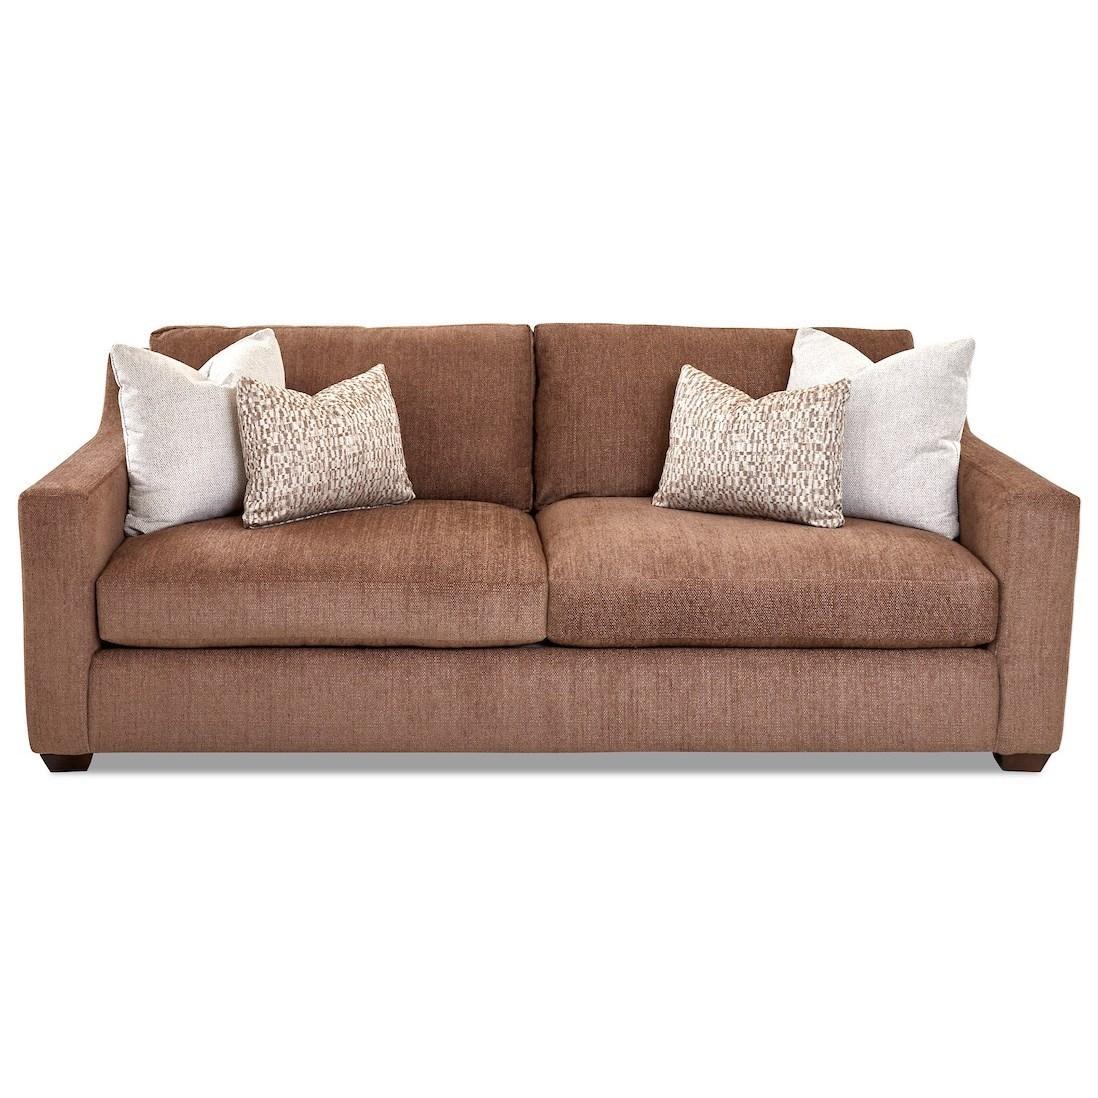 Novato Sofa by Klaussner at Johnny Janosik